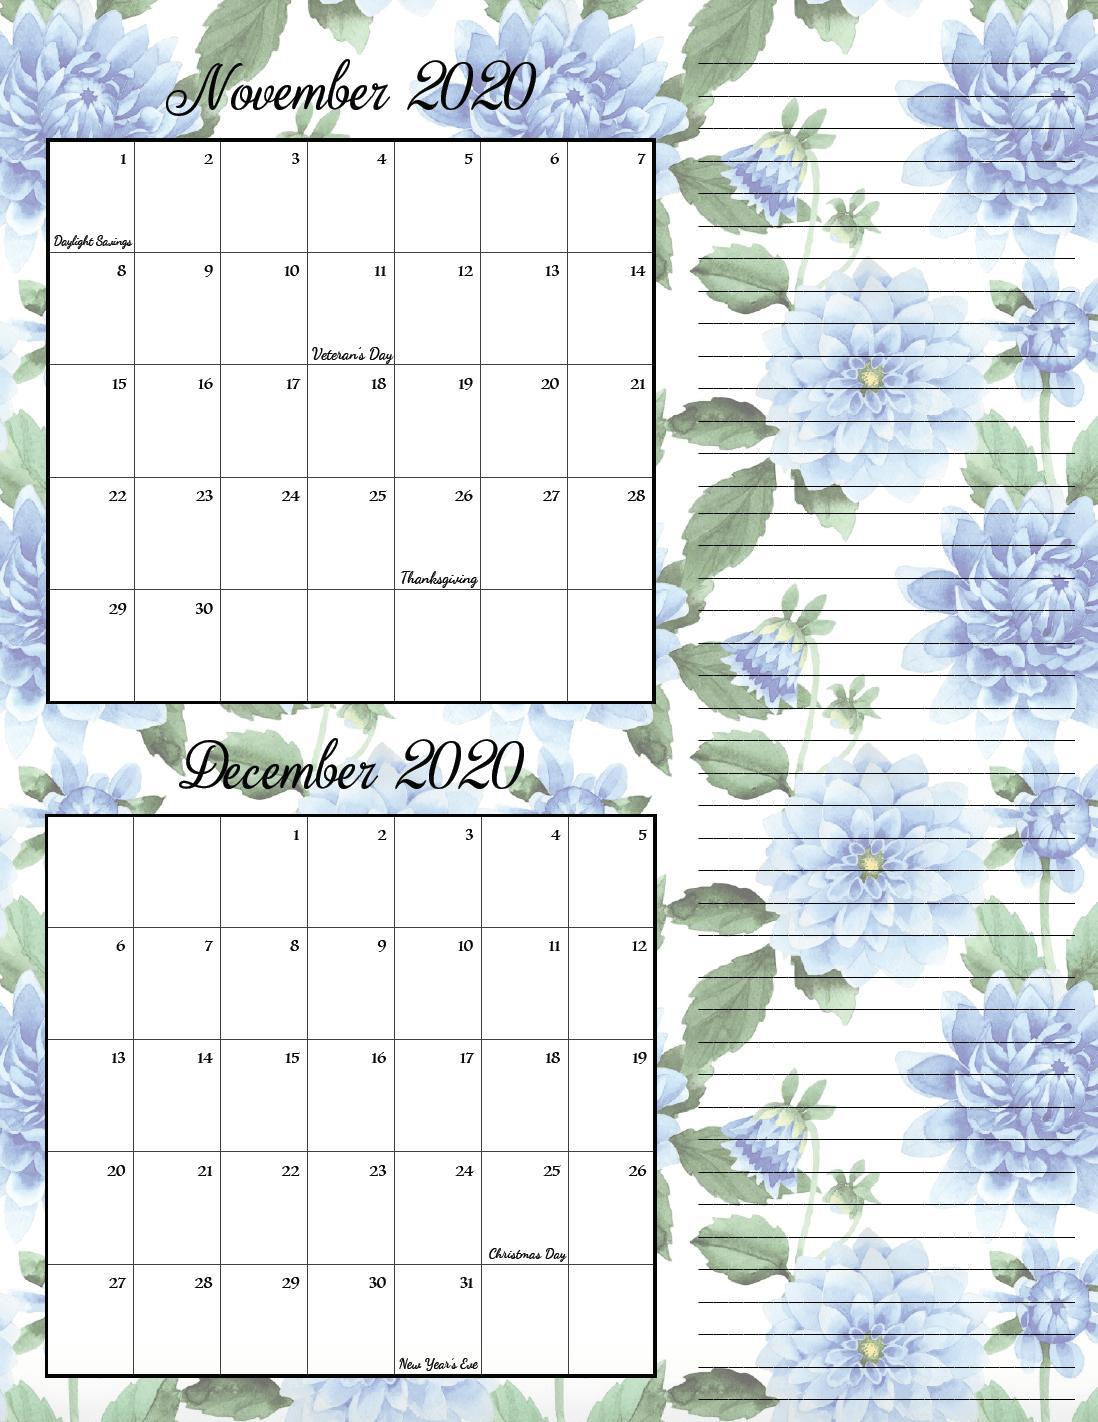 Floral theme November/December bimonthly calendar.